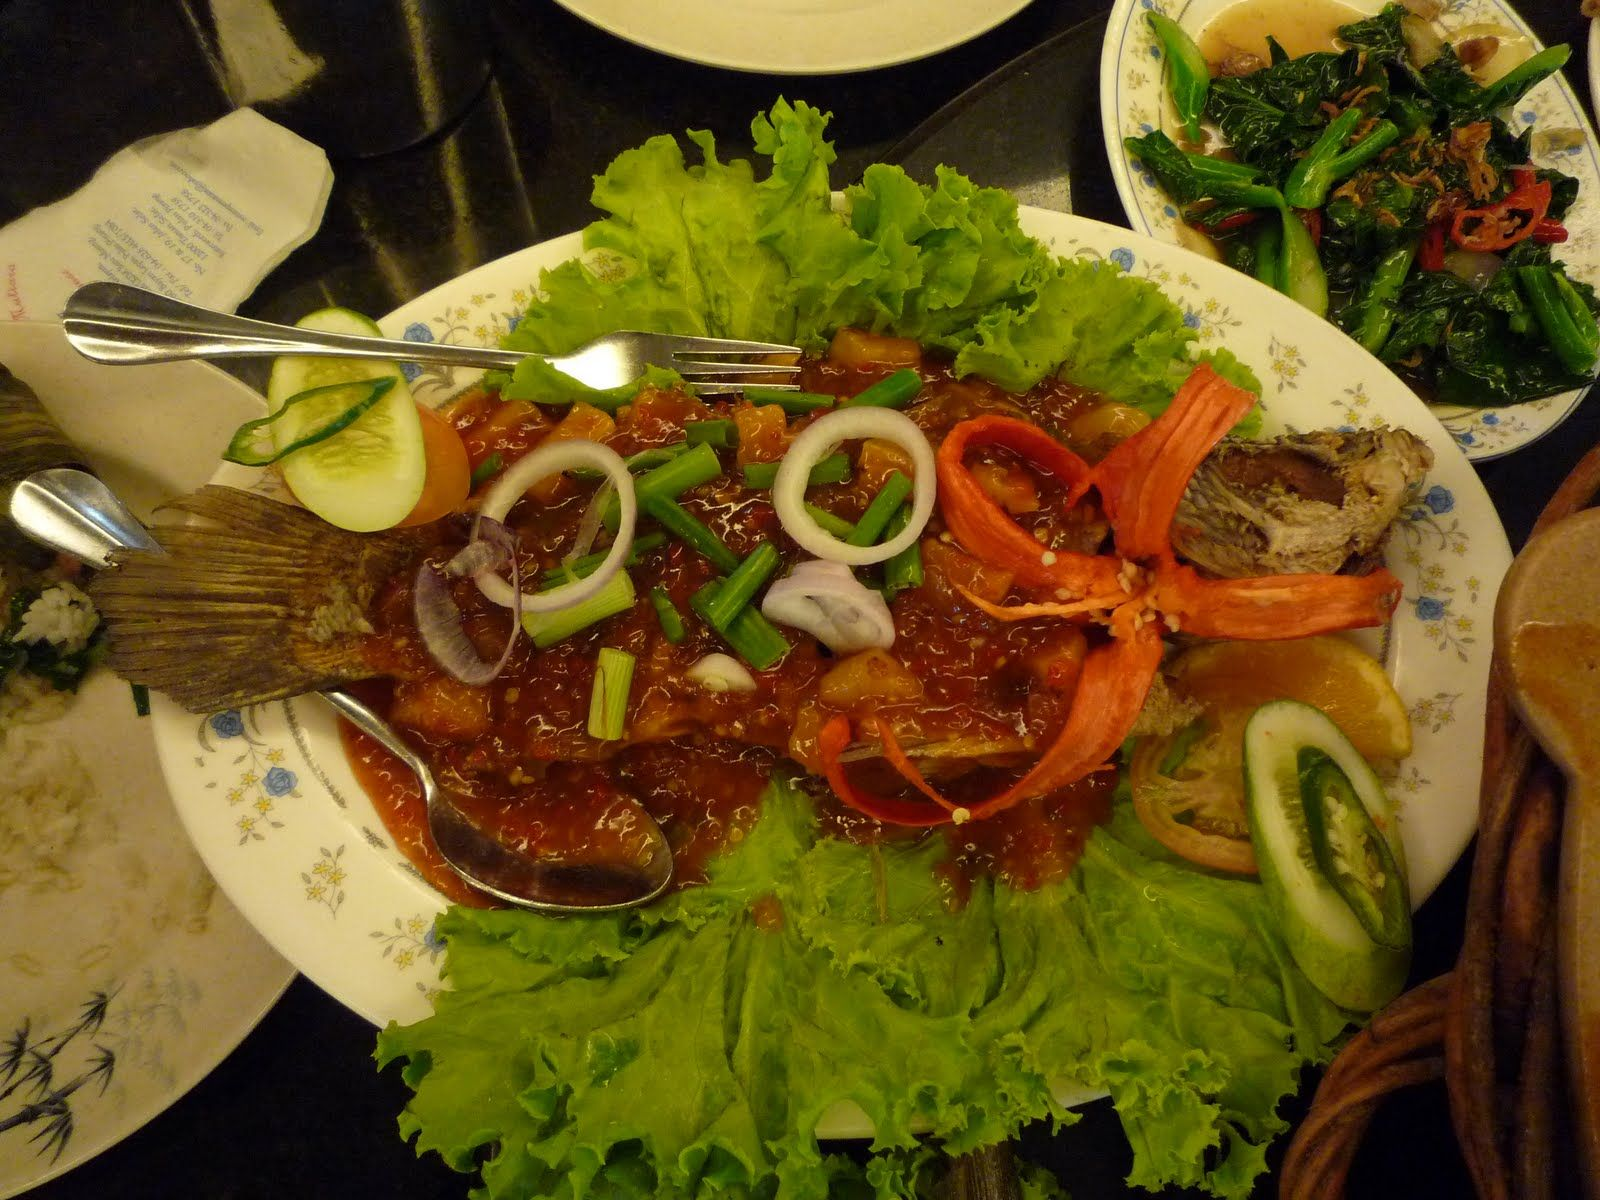 Pin by Wendy Lee on Malaysian Yummy Yummies | Pinterest